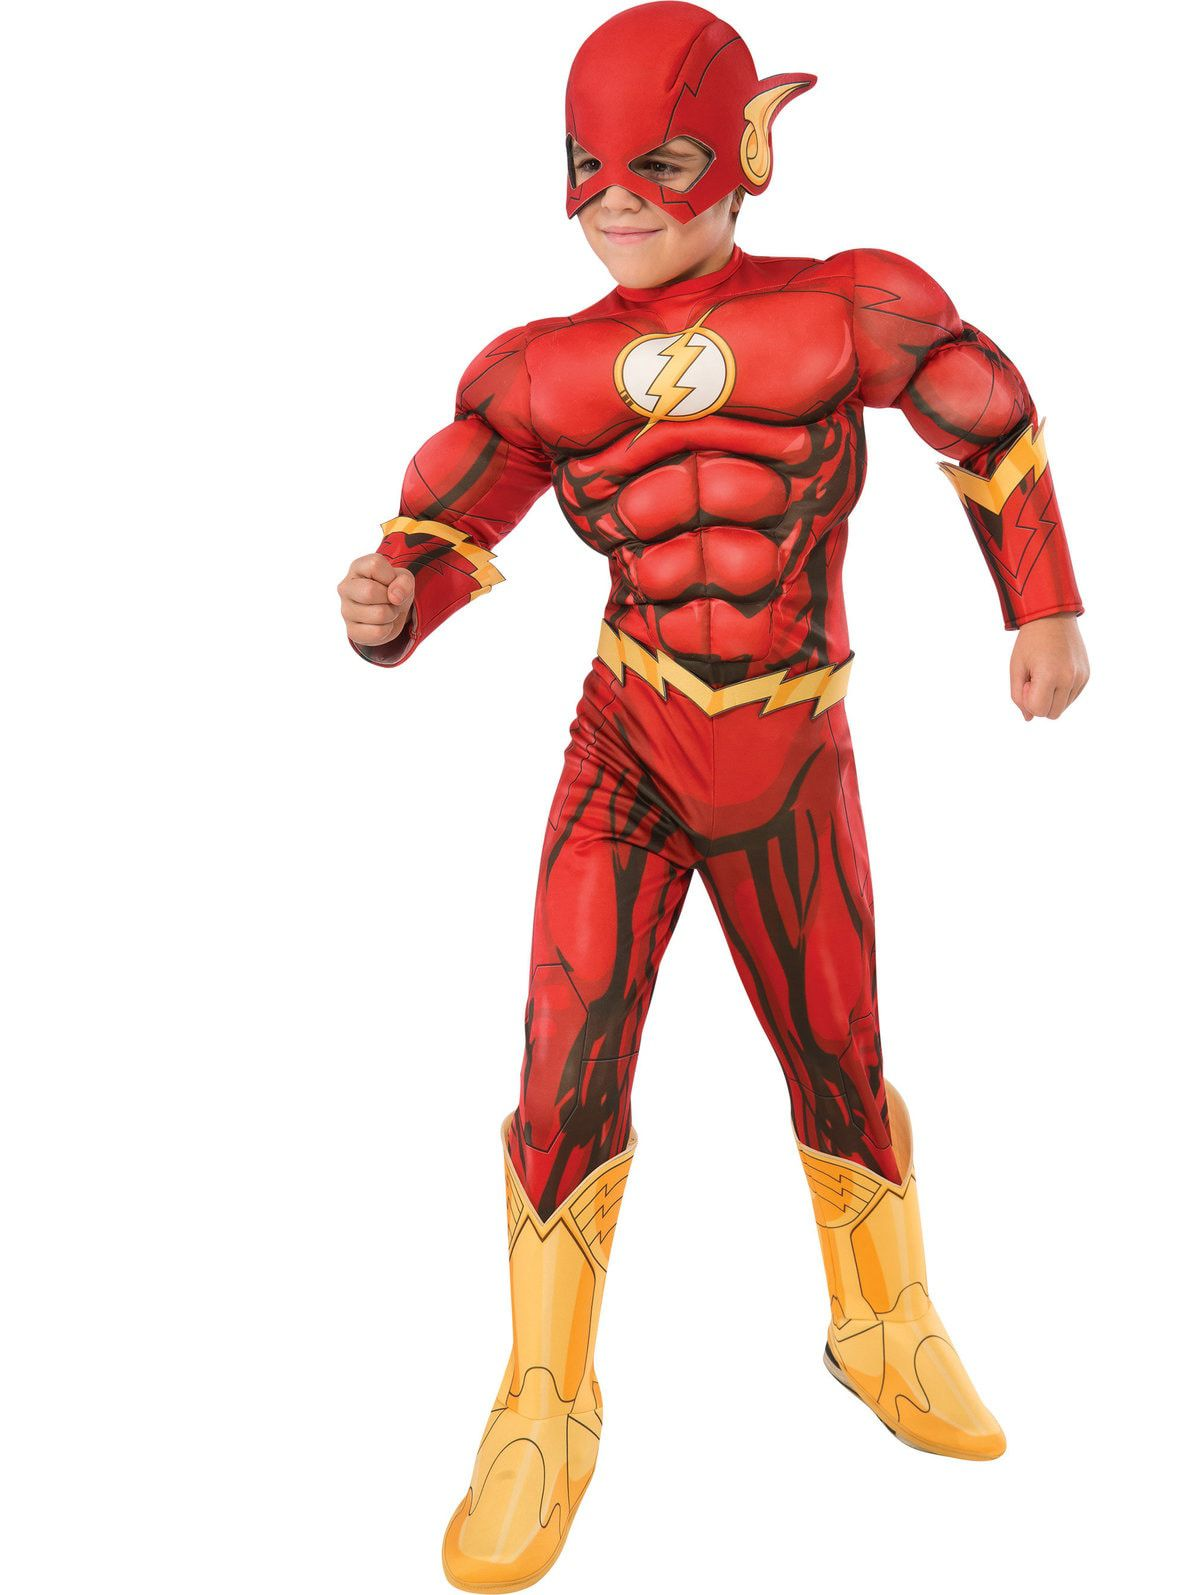 Bazzery Boy's Deluxe Flash Costume Fancy Dress Kids Fantasy Comics Movie Carnival Party Halloween Fl